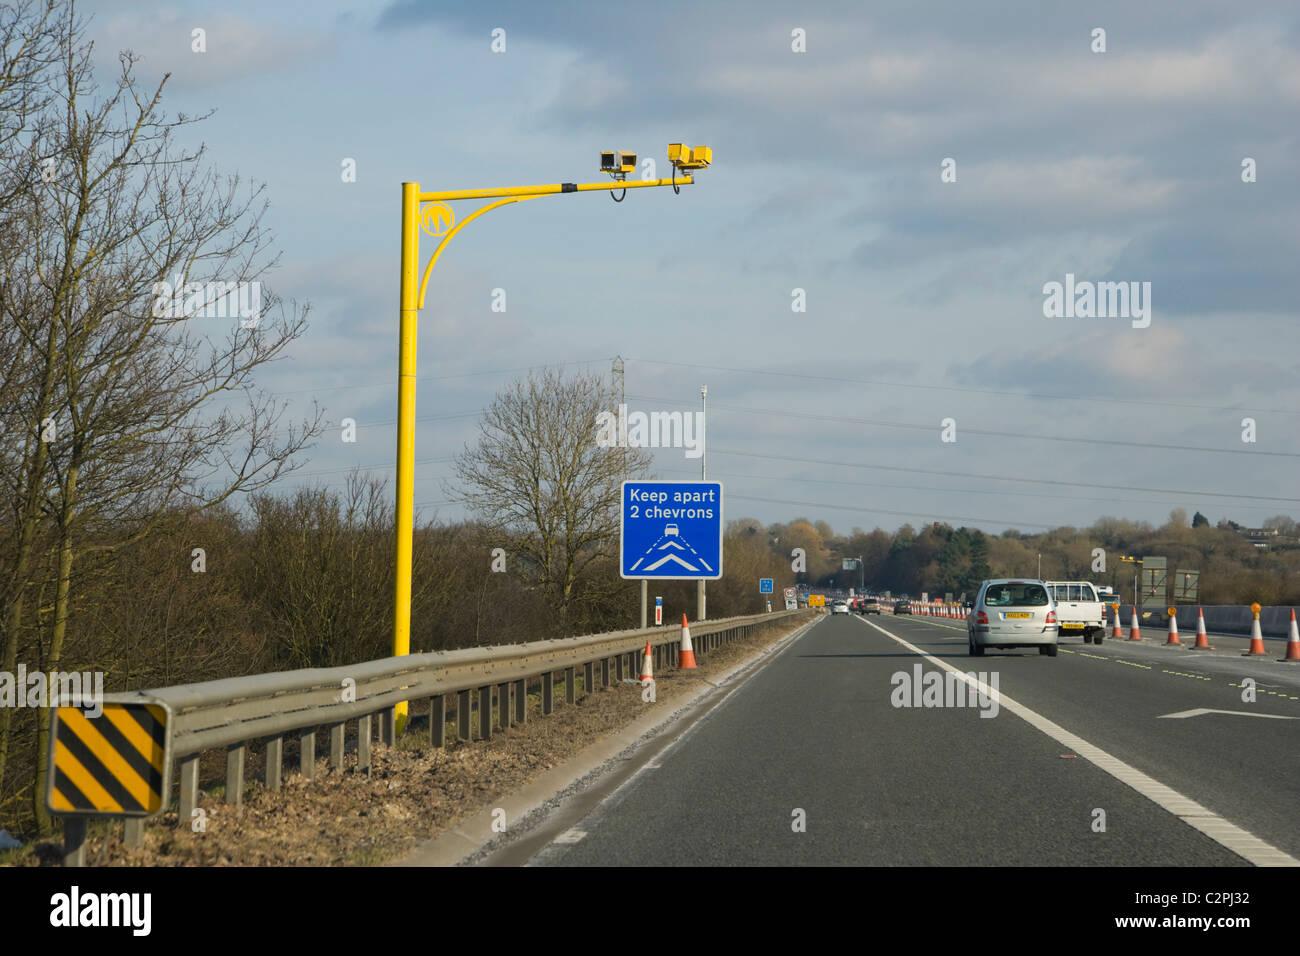 Average Speed Cameras Uk Stock Photos & Average Speed